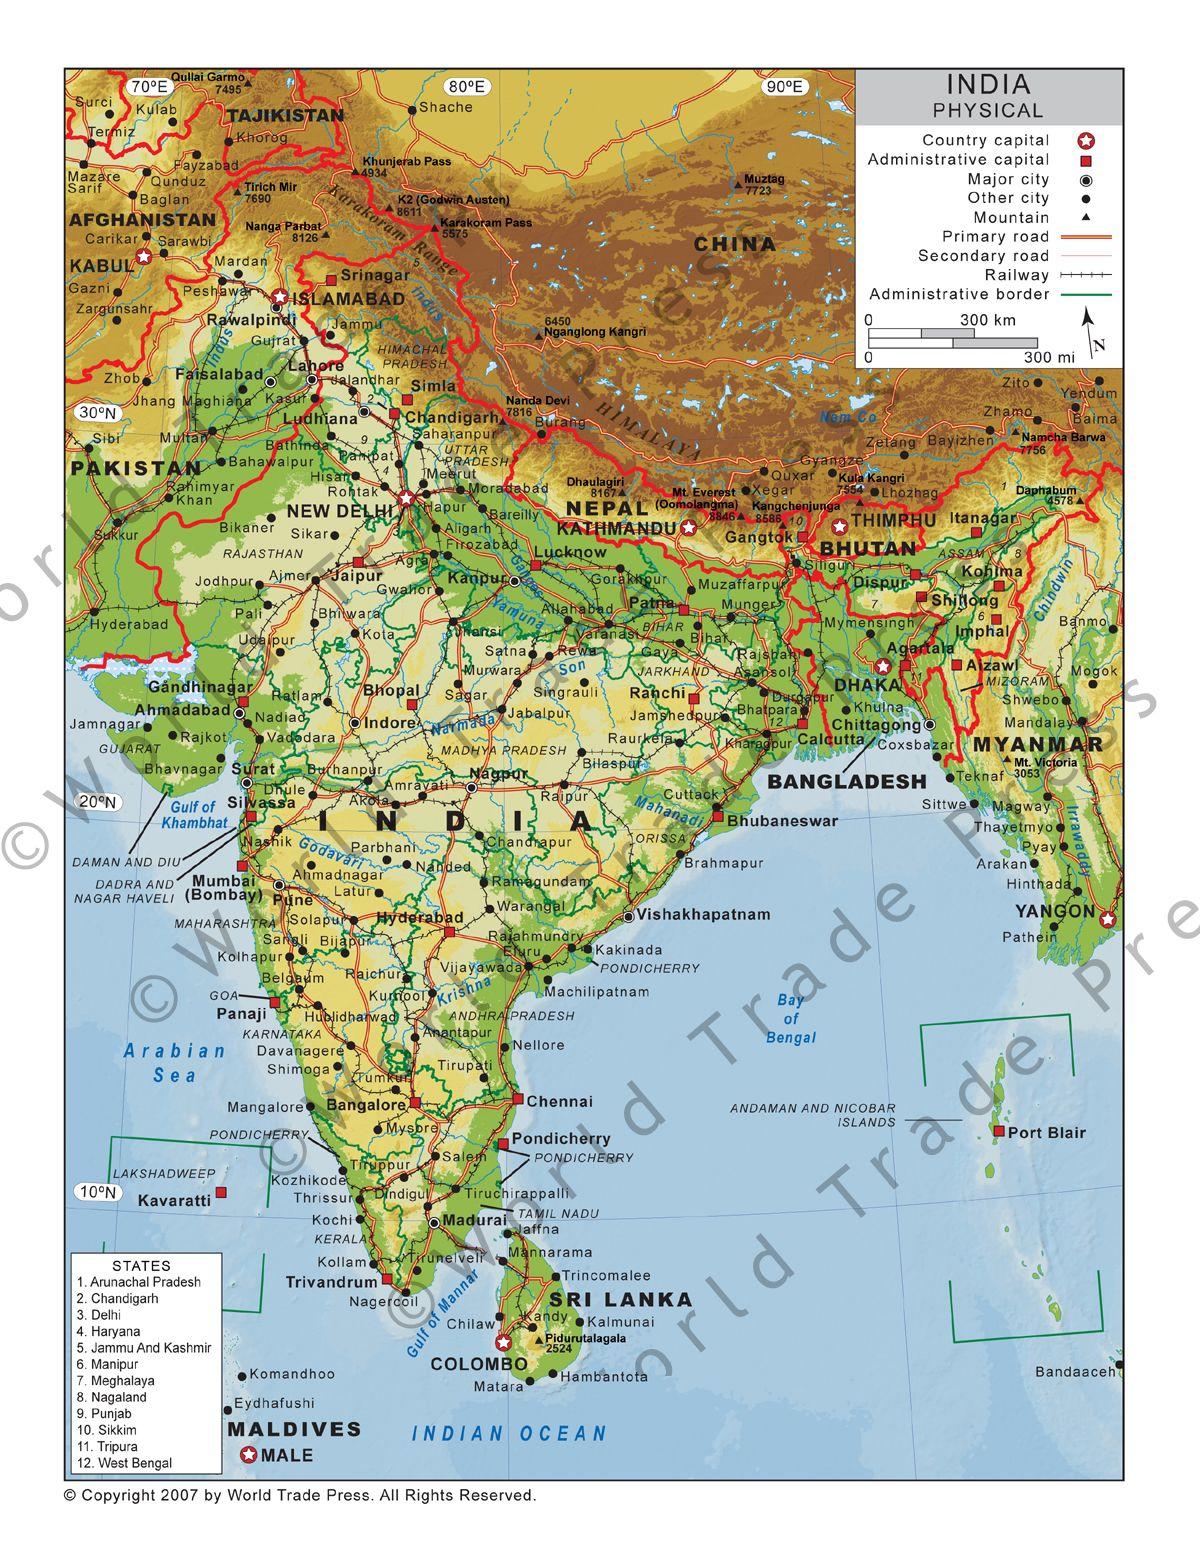 Physical Map of India rrrrrrr Pinterest India Sea level and